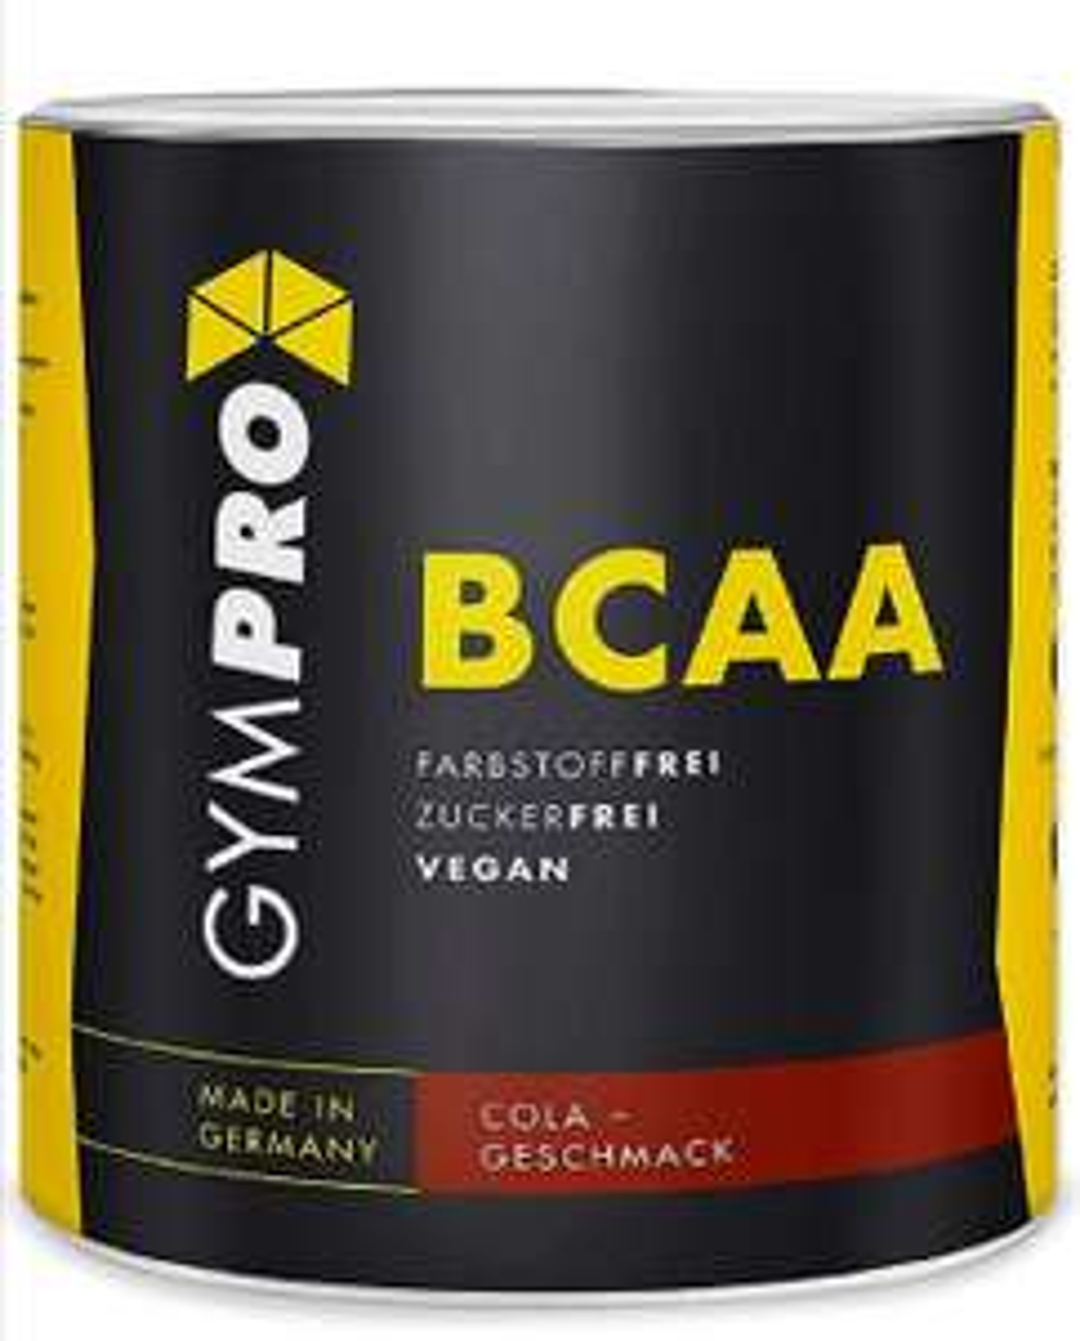 300 g BCAA pulver verschiedene Geschmacksrichtungen